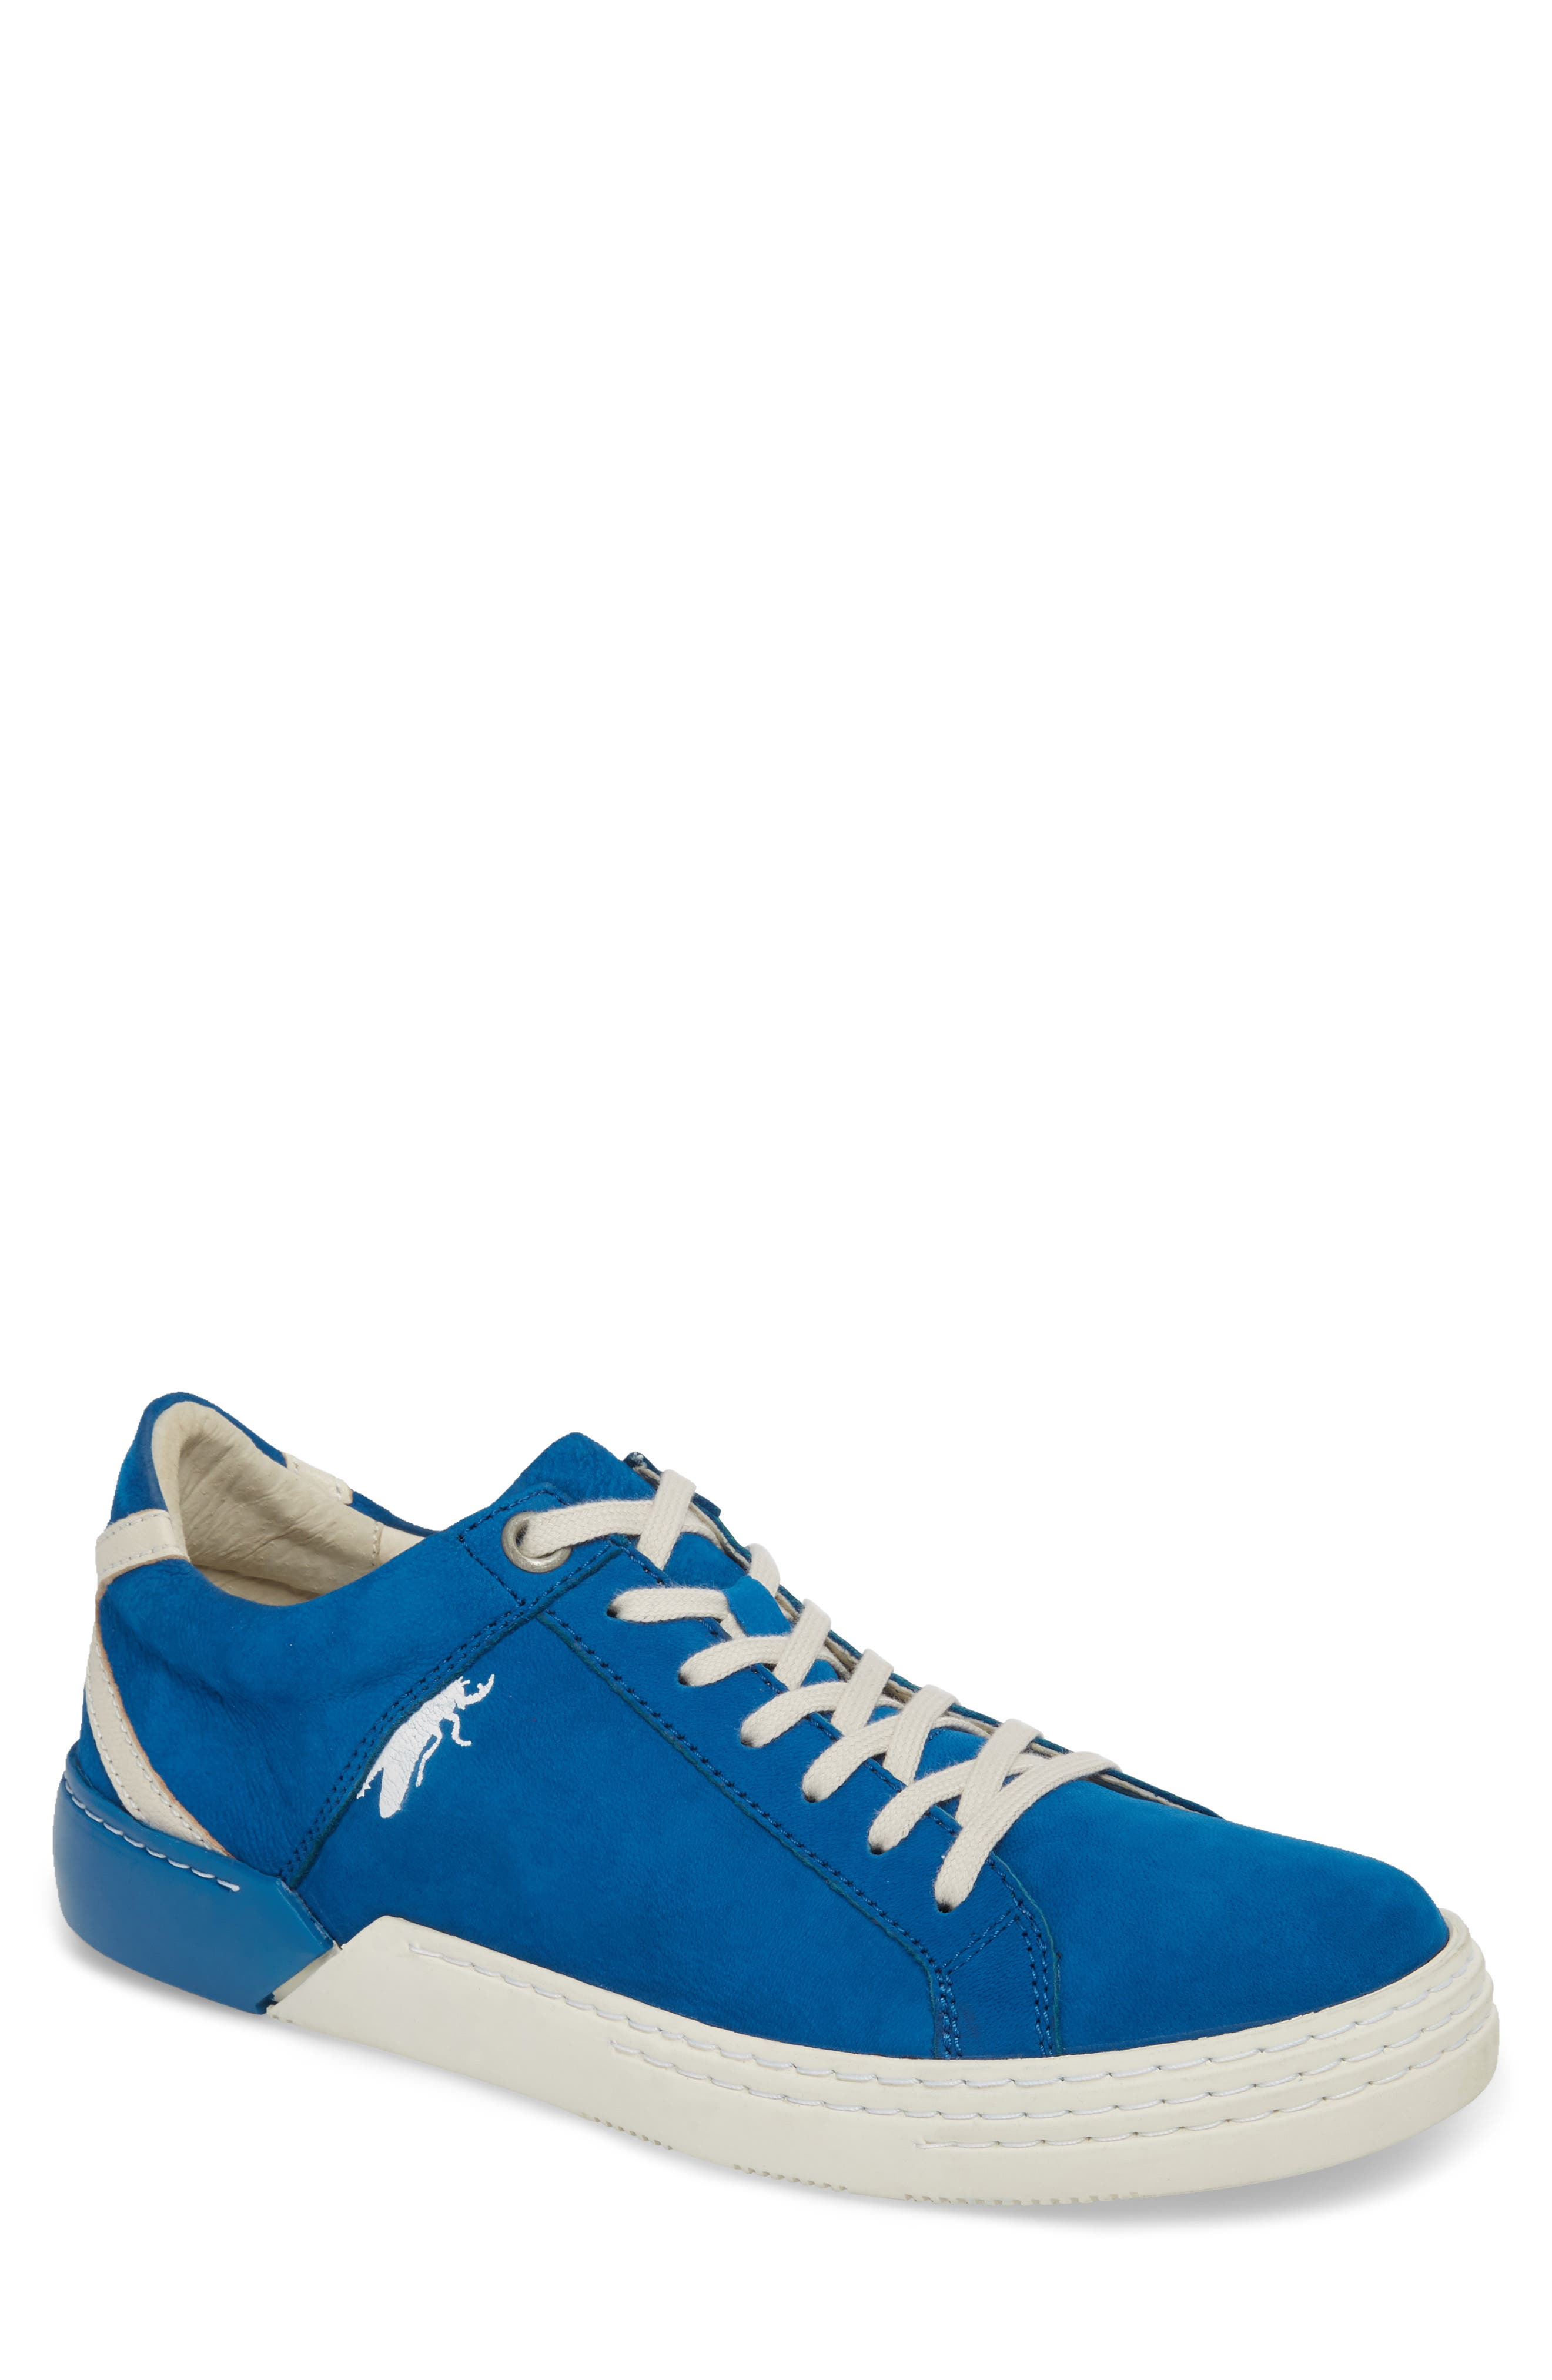 Sene Low Top Sneaker,                         Main,                         color, ELECTRIC BLUE LEATHER